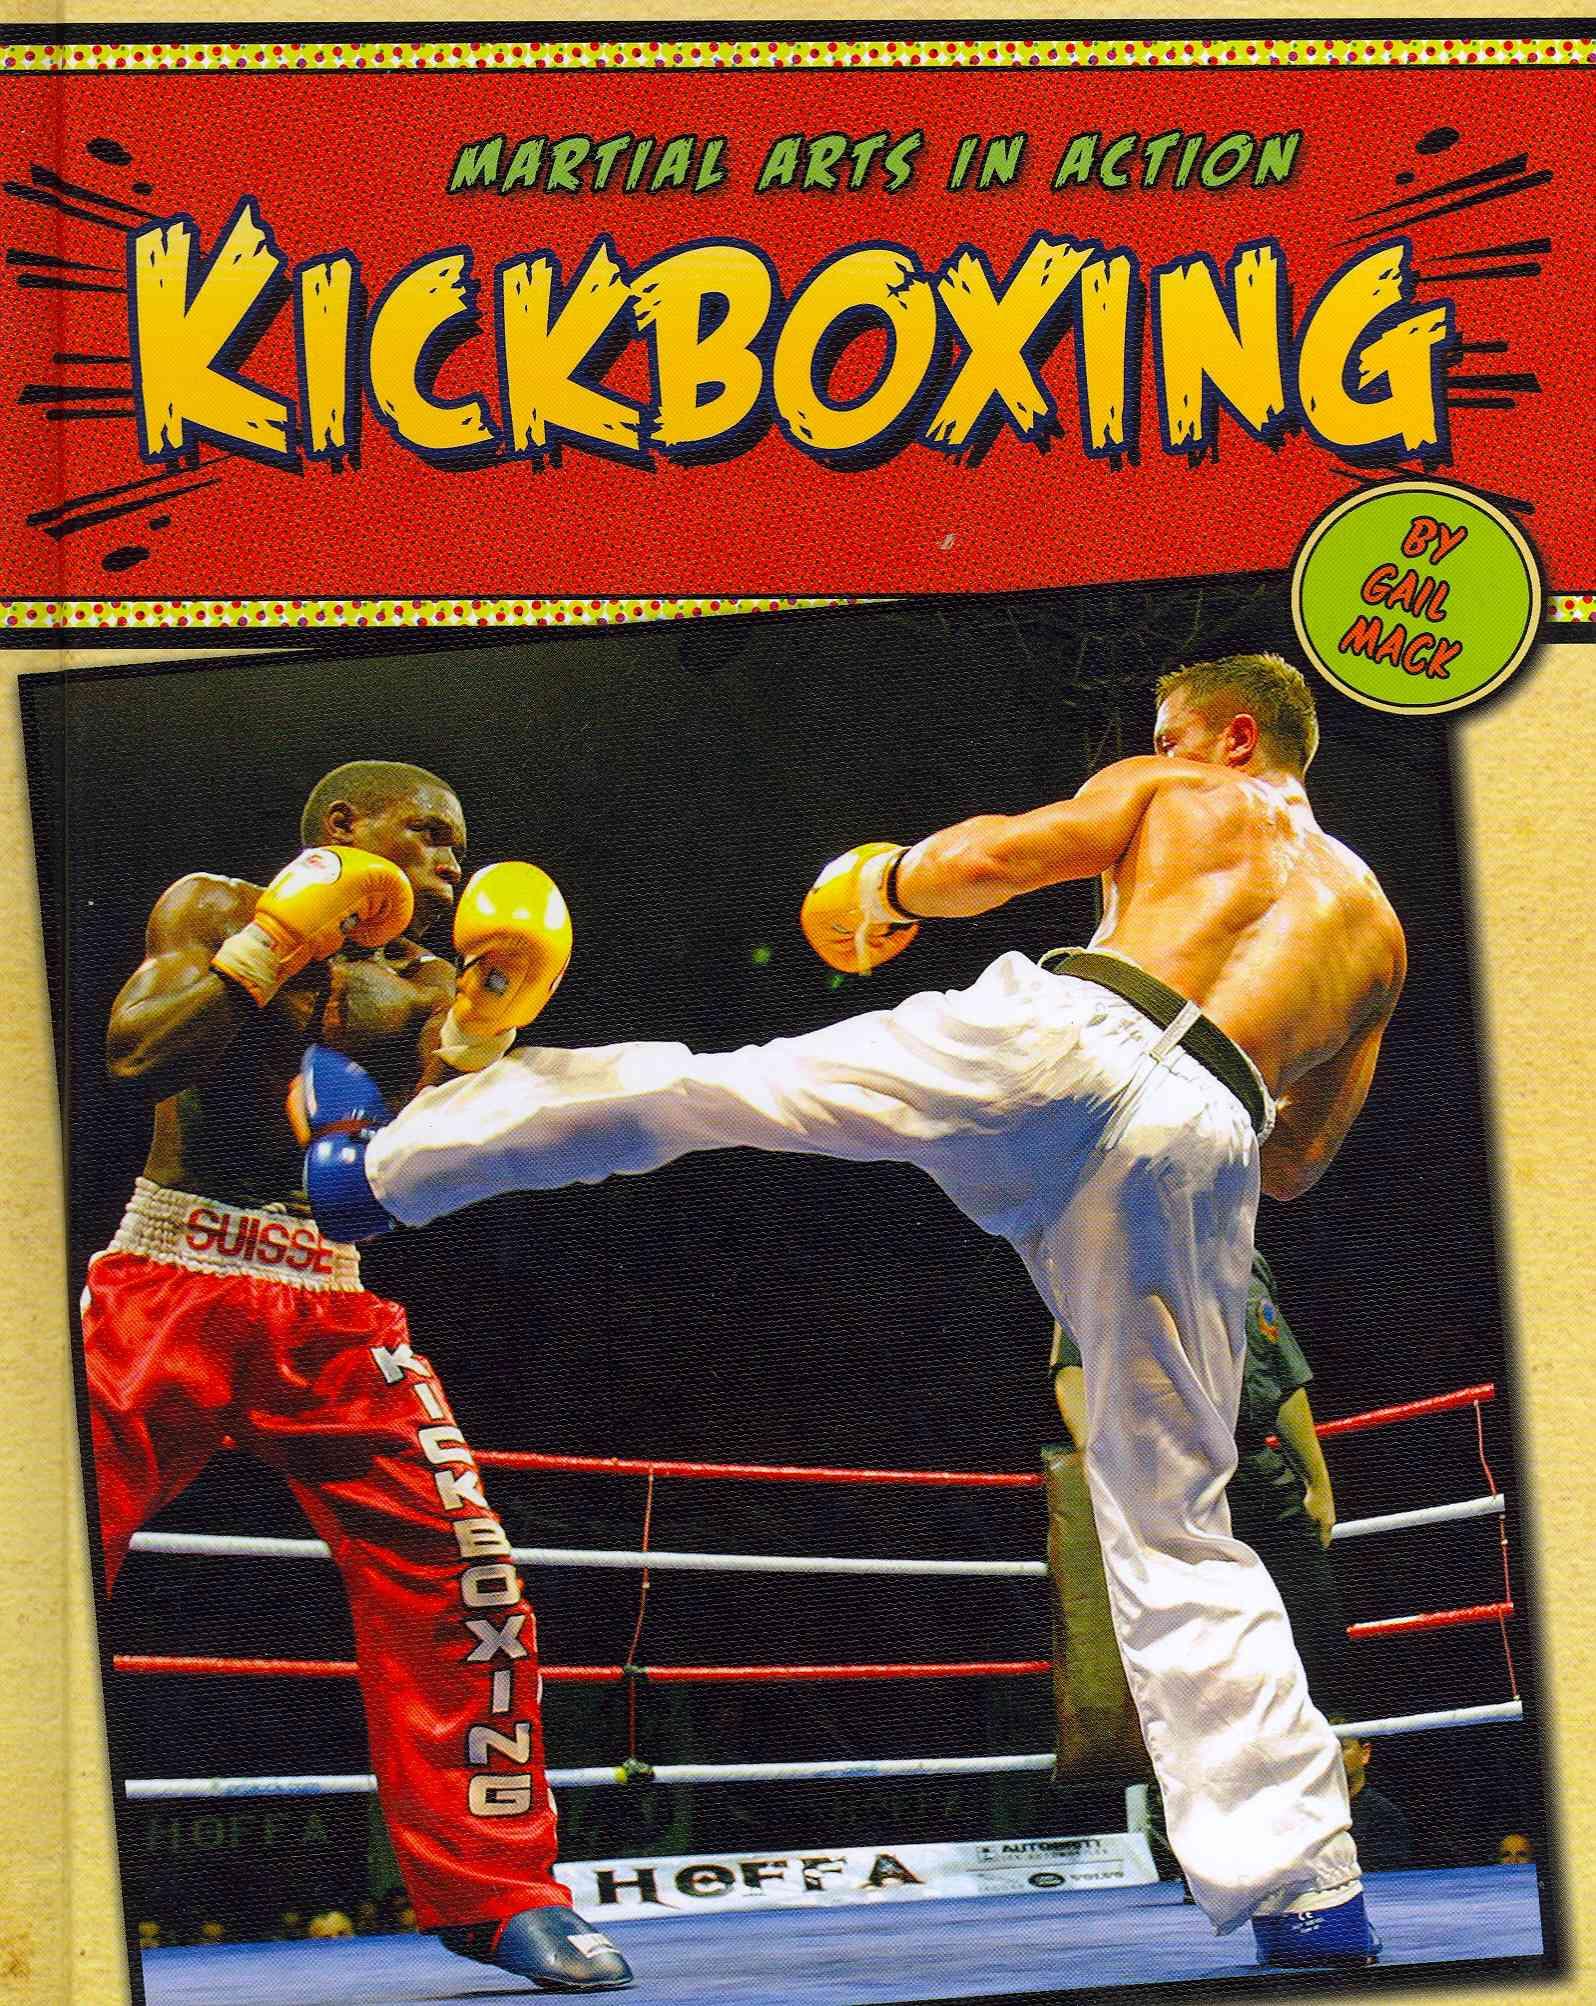 Kickboxing (Hardcover)